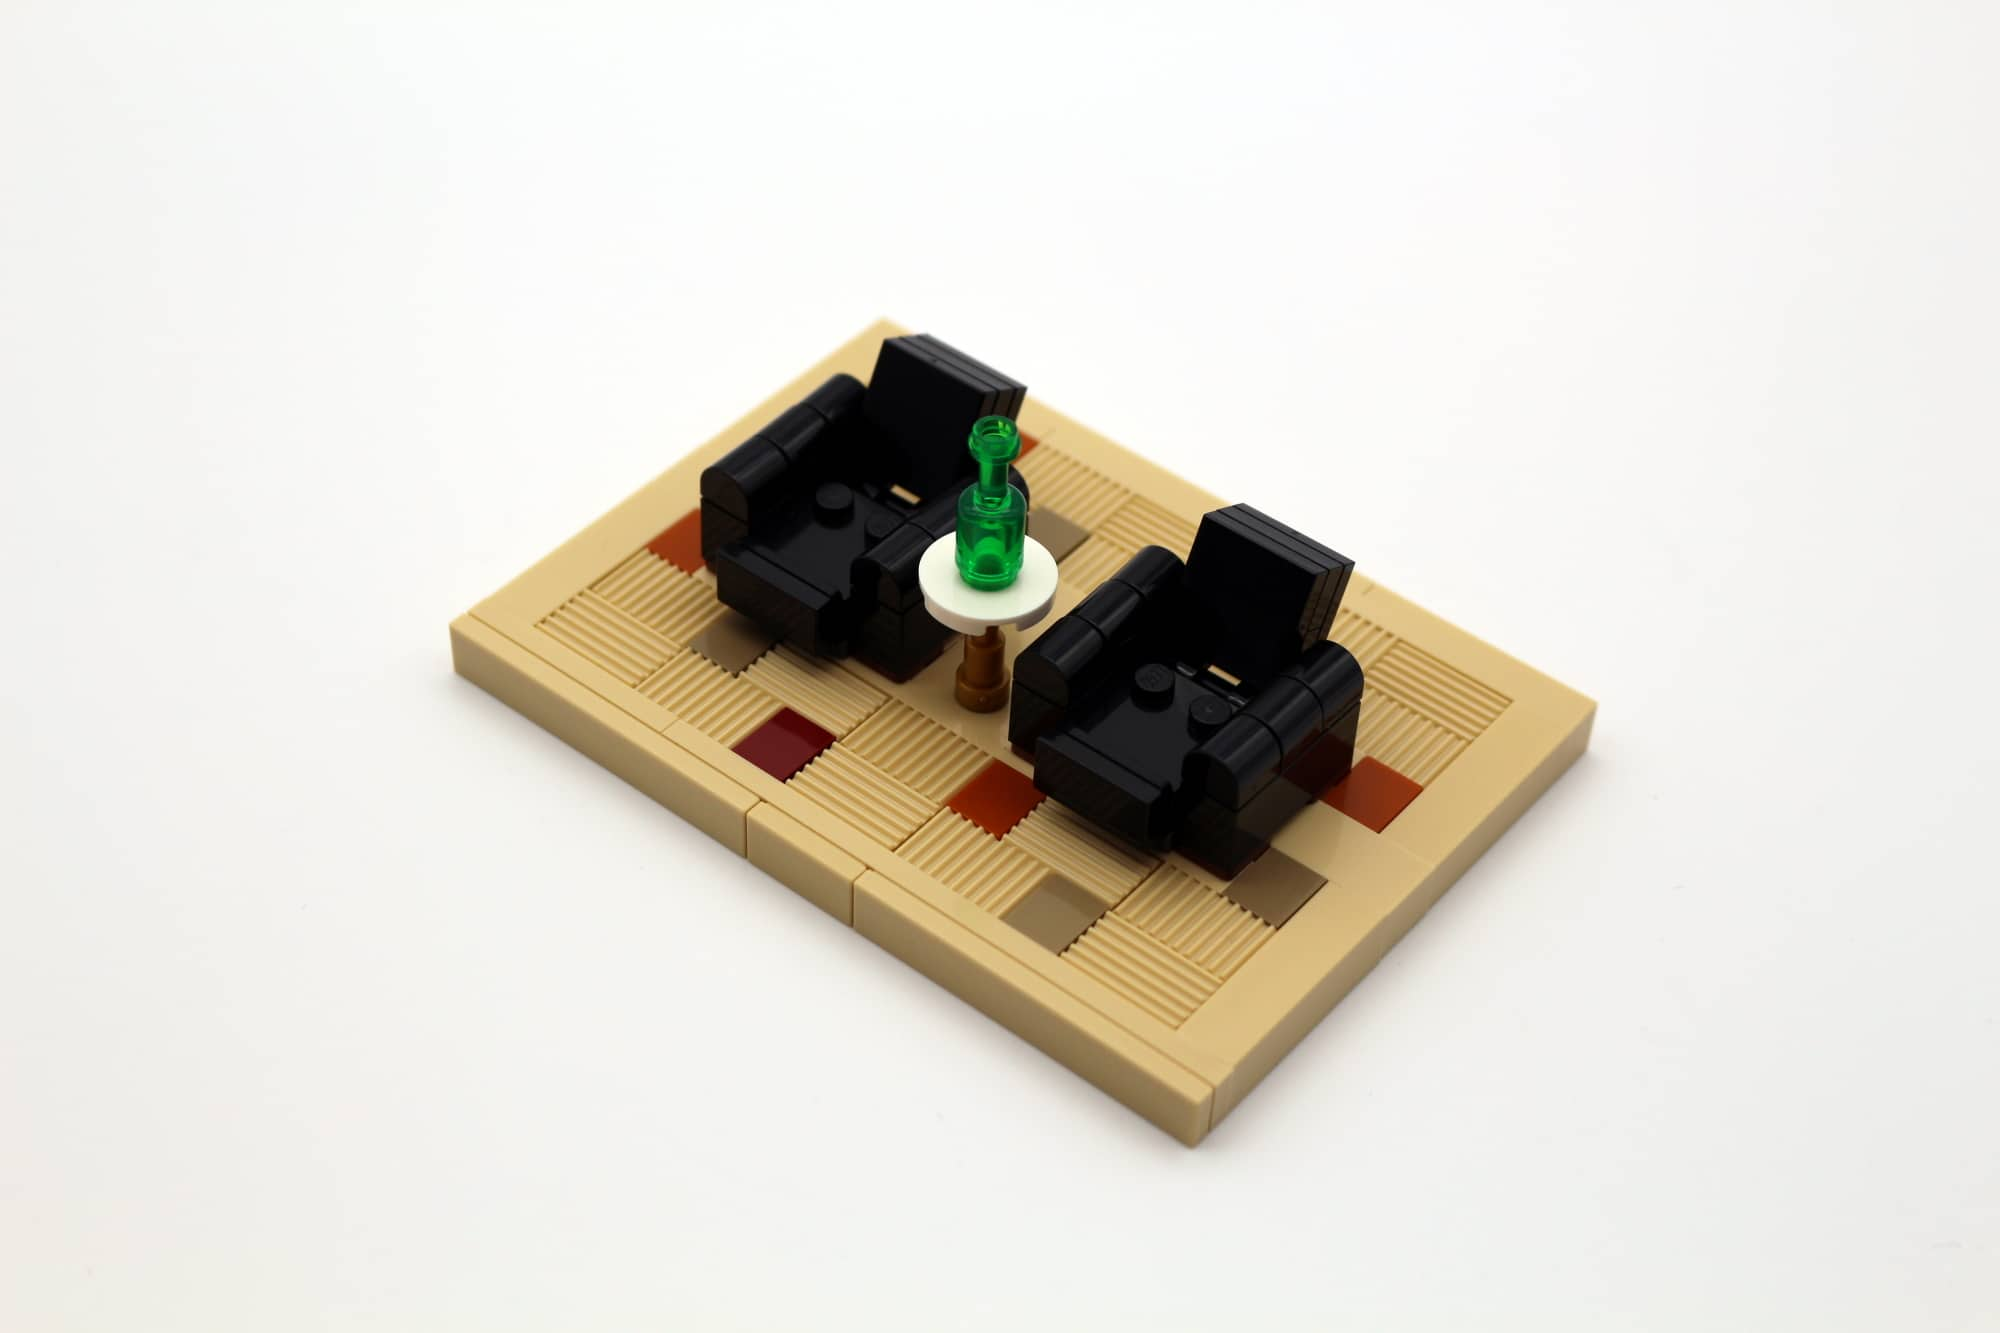 LEGO Friends 10292 The Friends Apartments 10